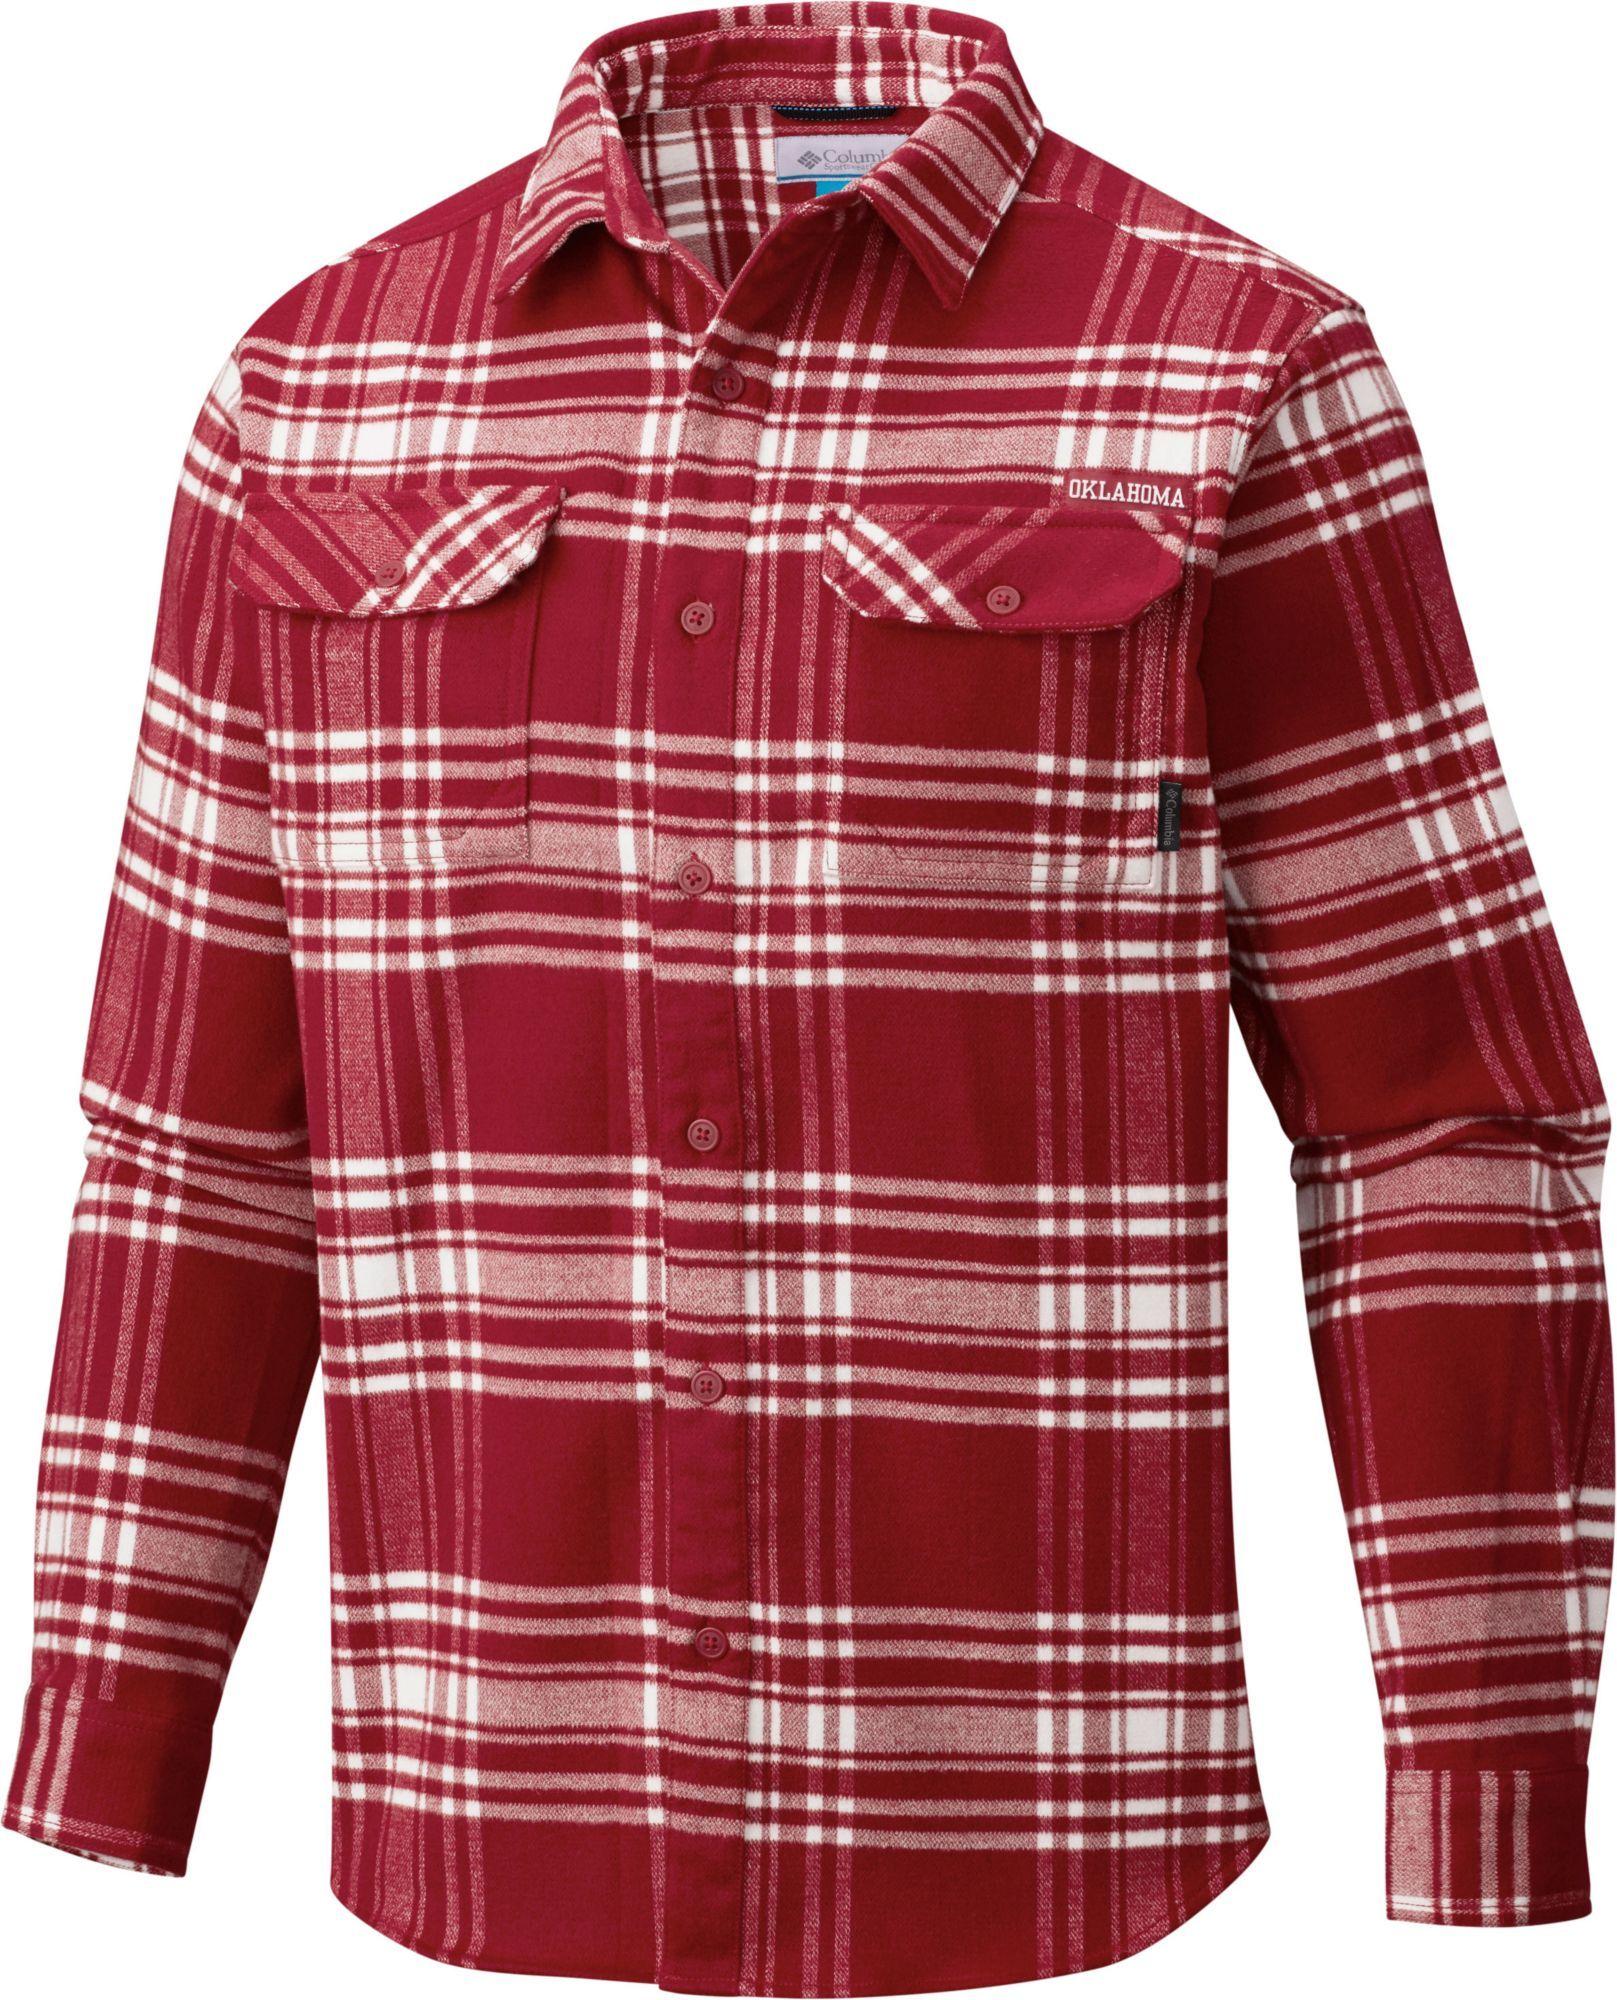 4c91462b3f0 Columbia Men's Michigan State Spartans Crimson/Cream Plaid Flare Gun  Flannel Long Sleeve Shirt, Multi